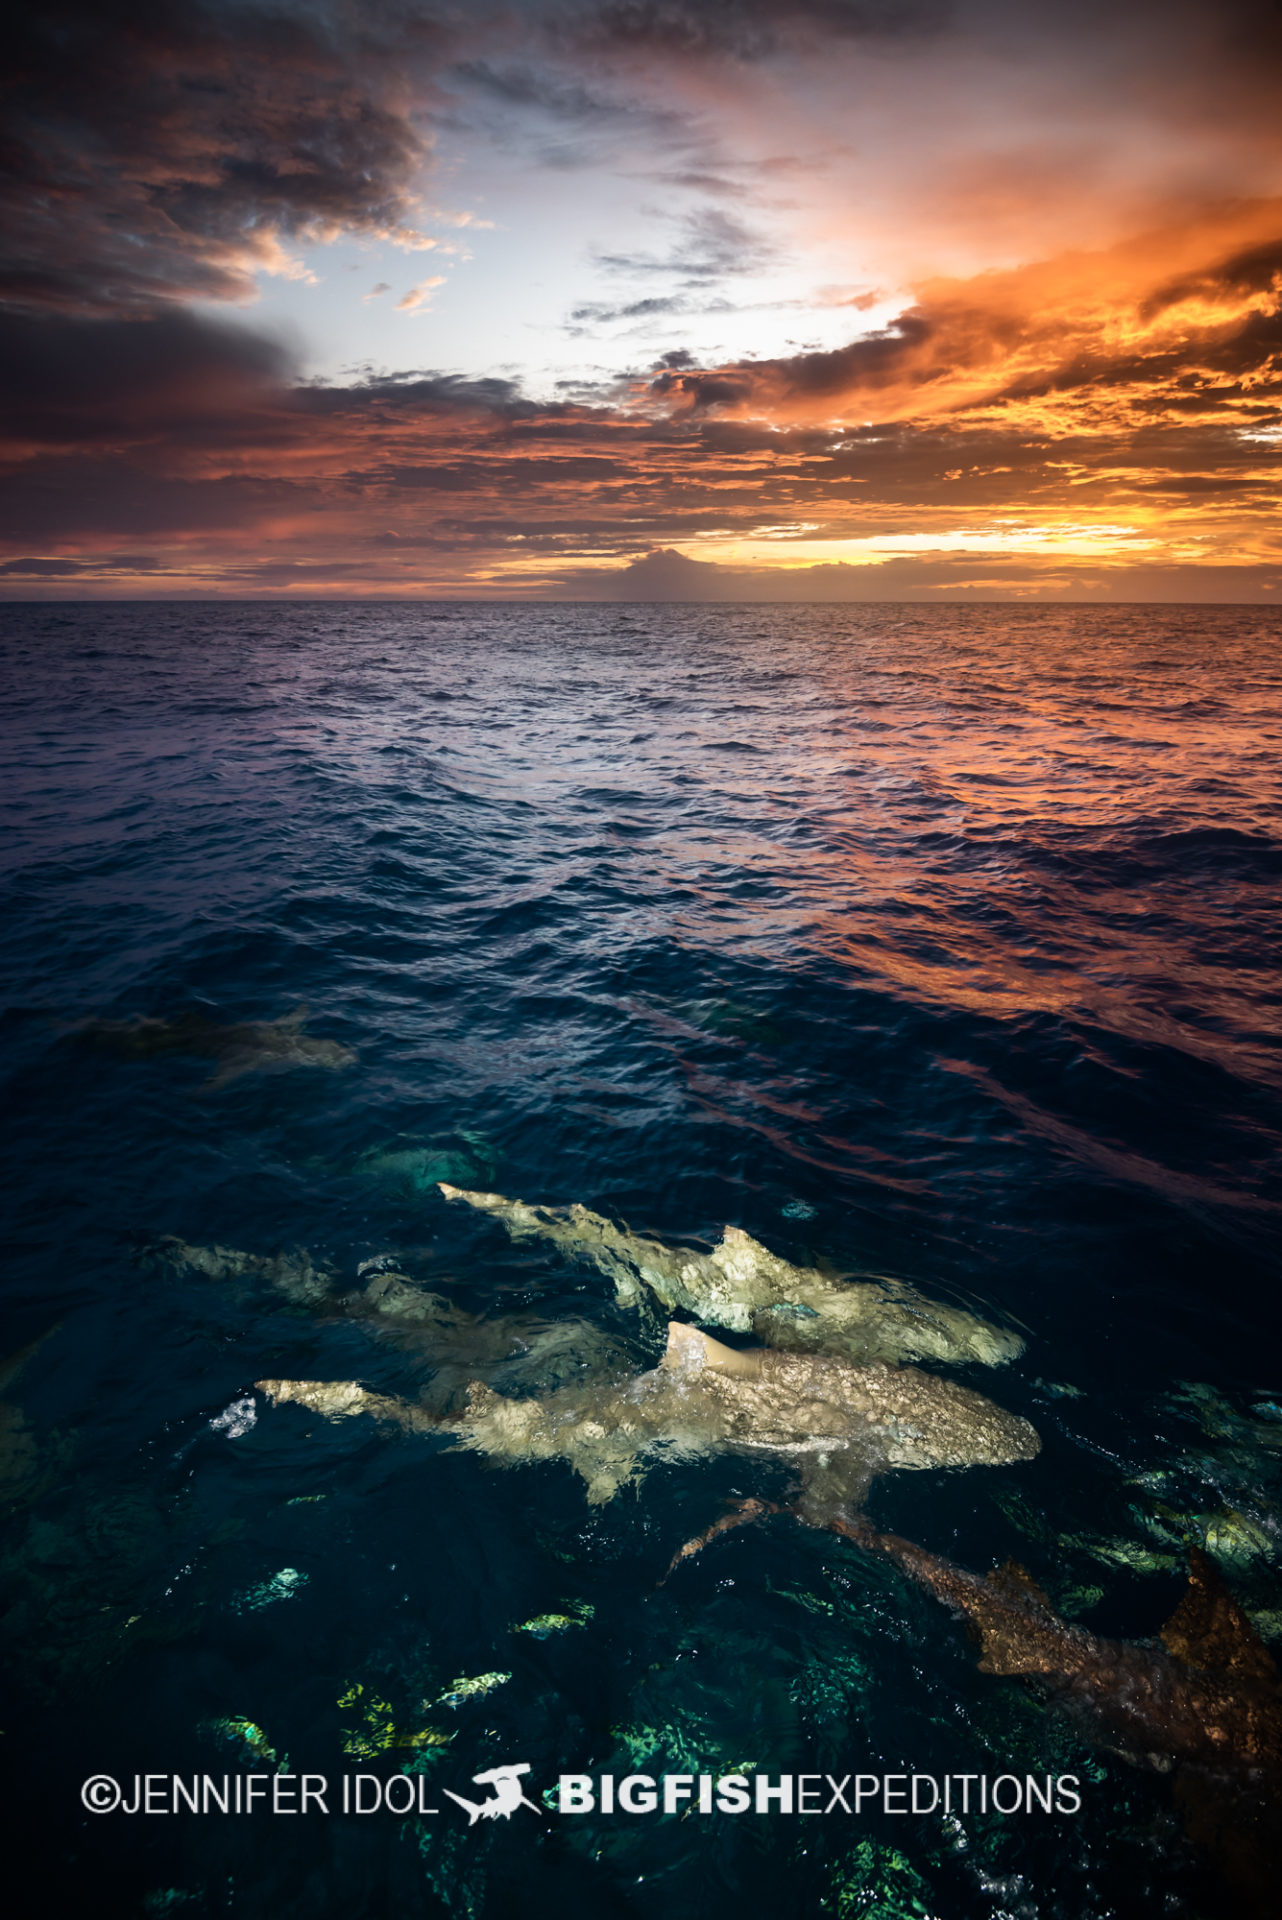 Lemon sharks at sunset